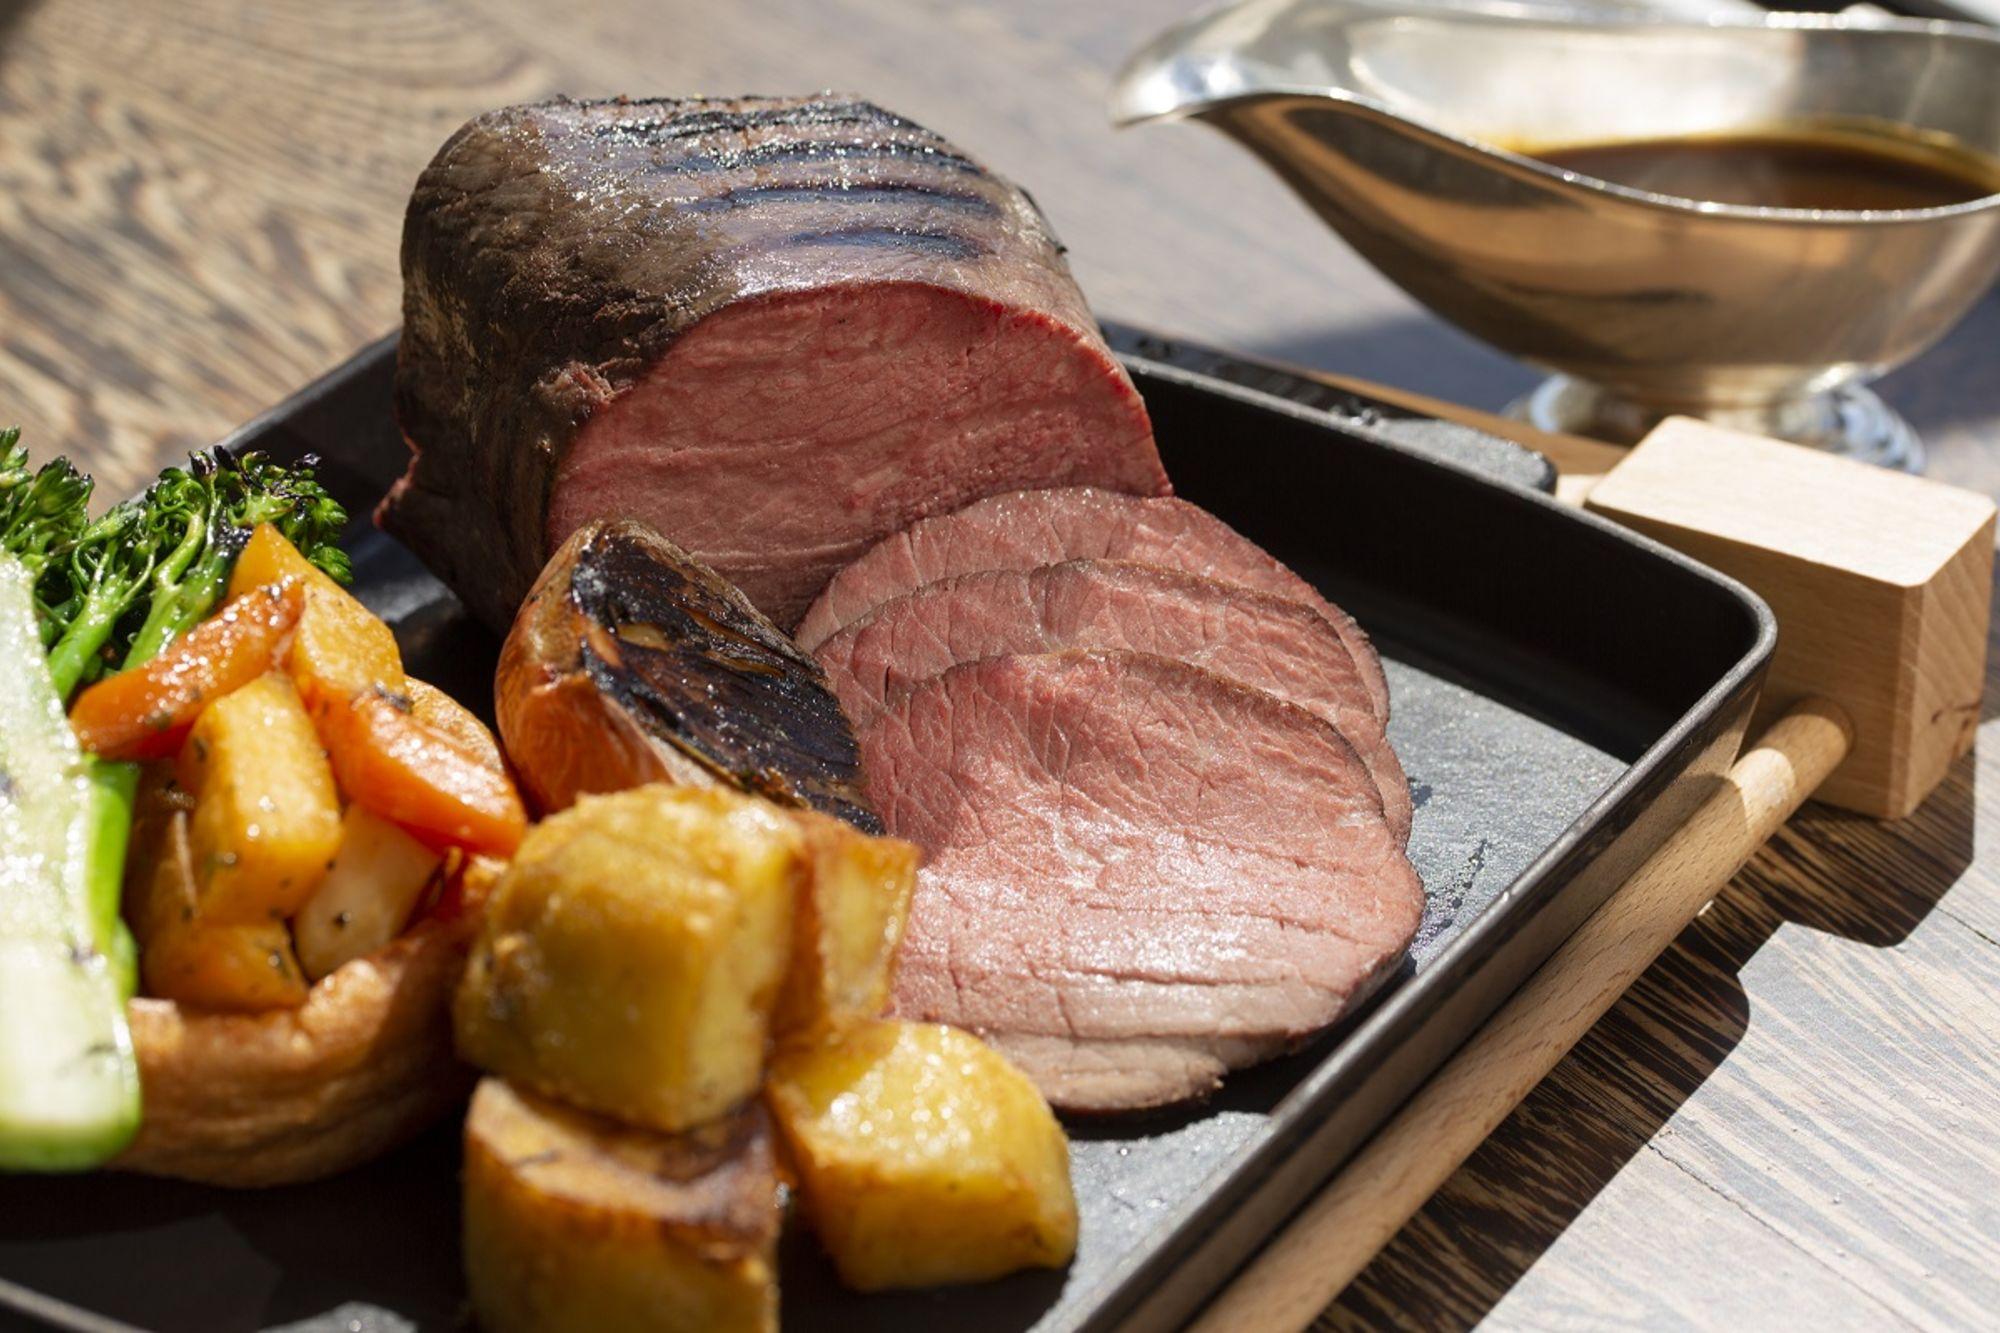 Rib Steak, Vegetables, and Potatoes